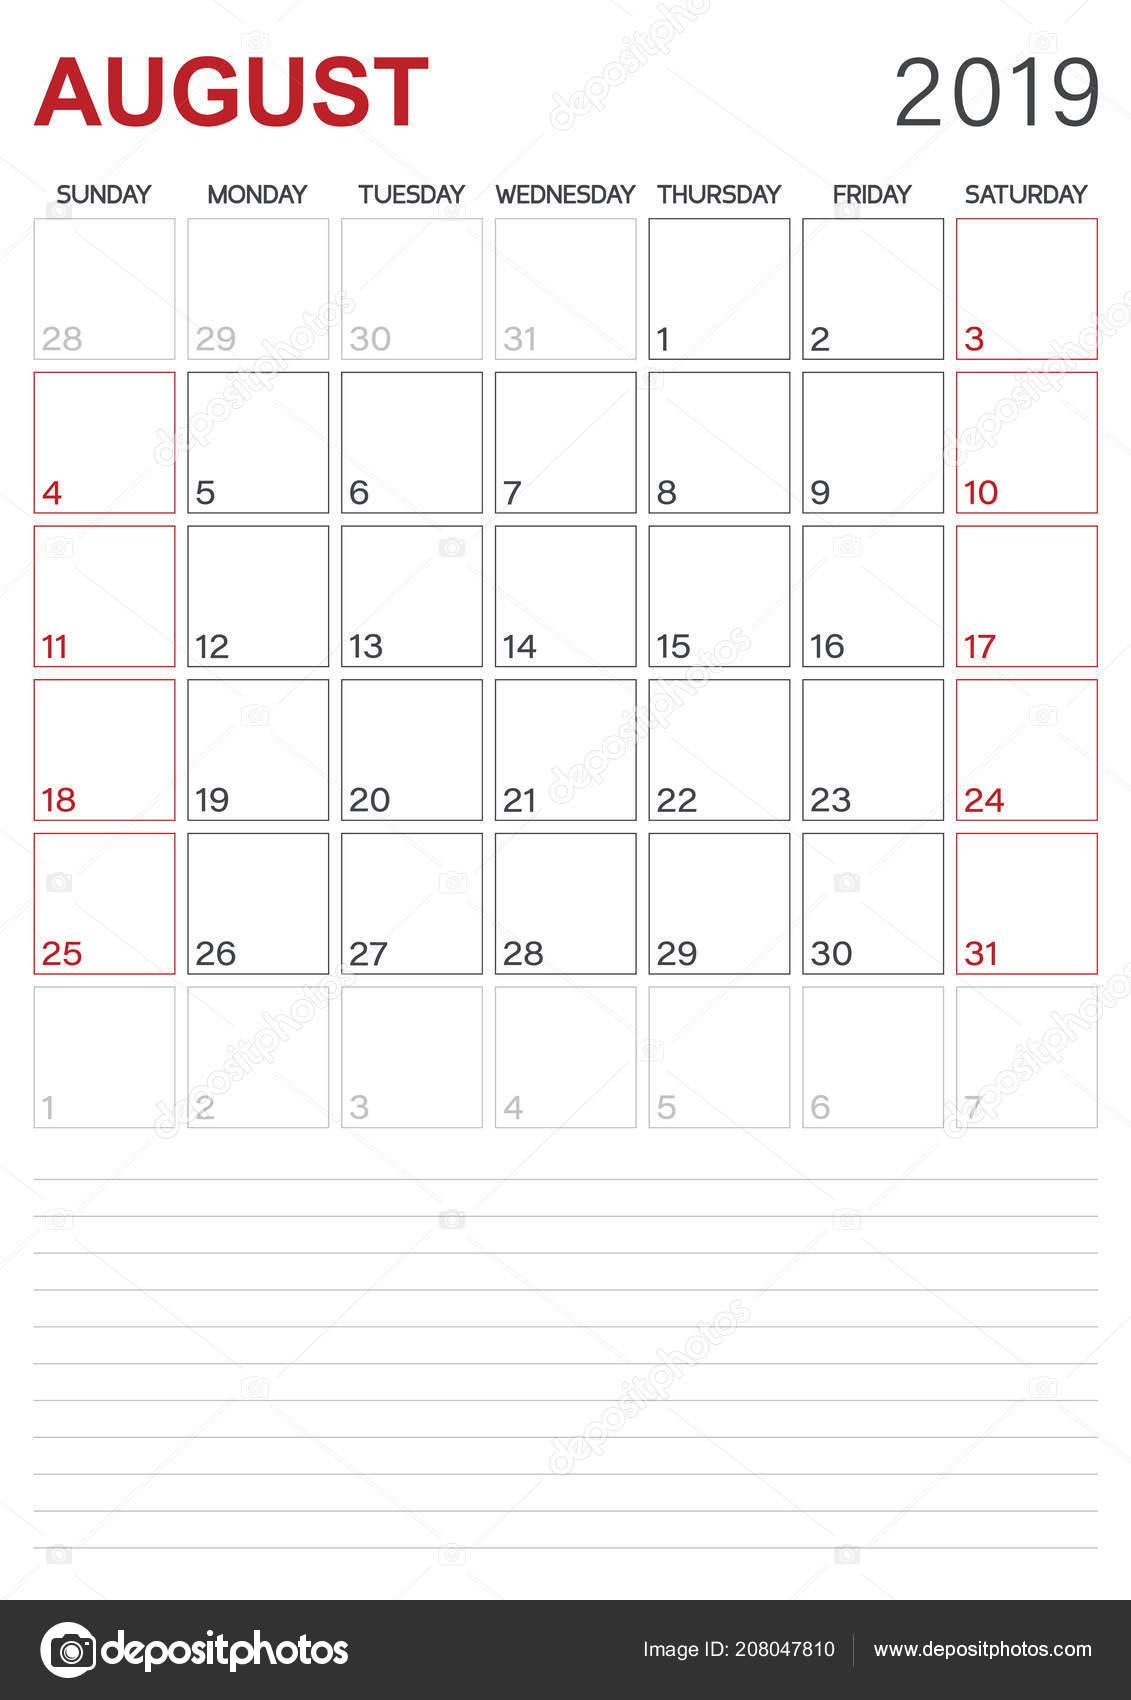 August monthly calendar 2019